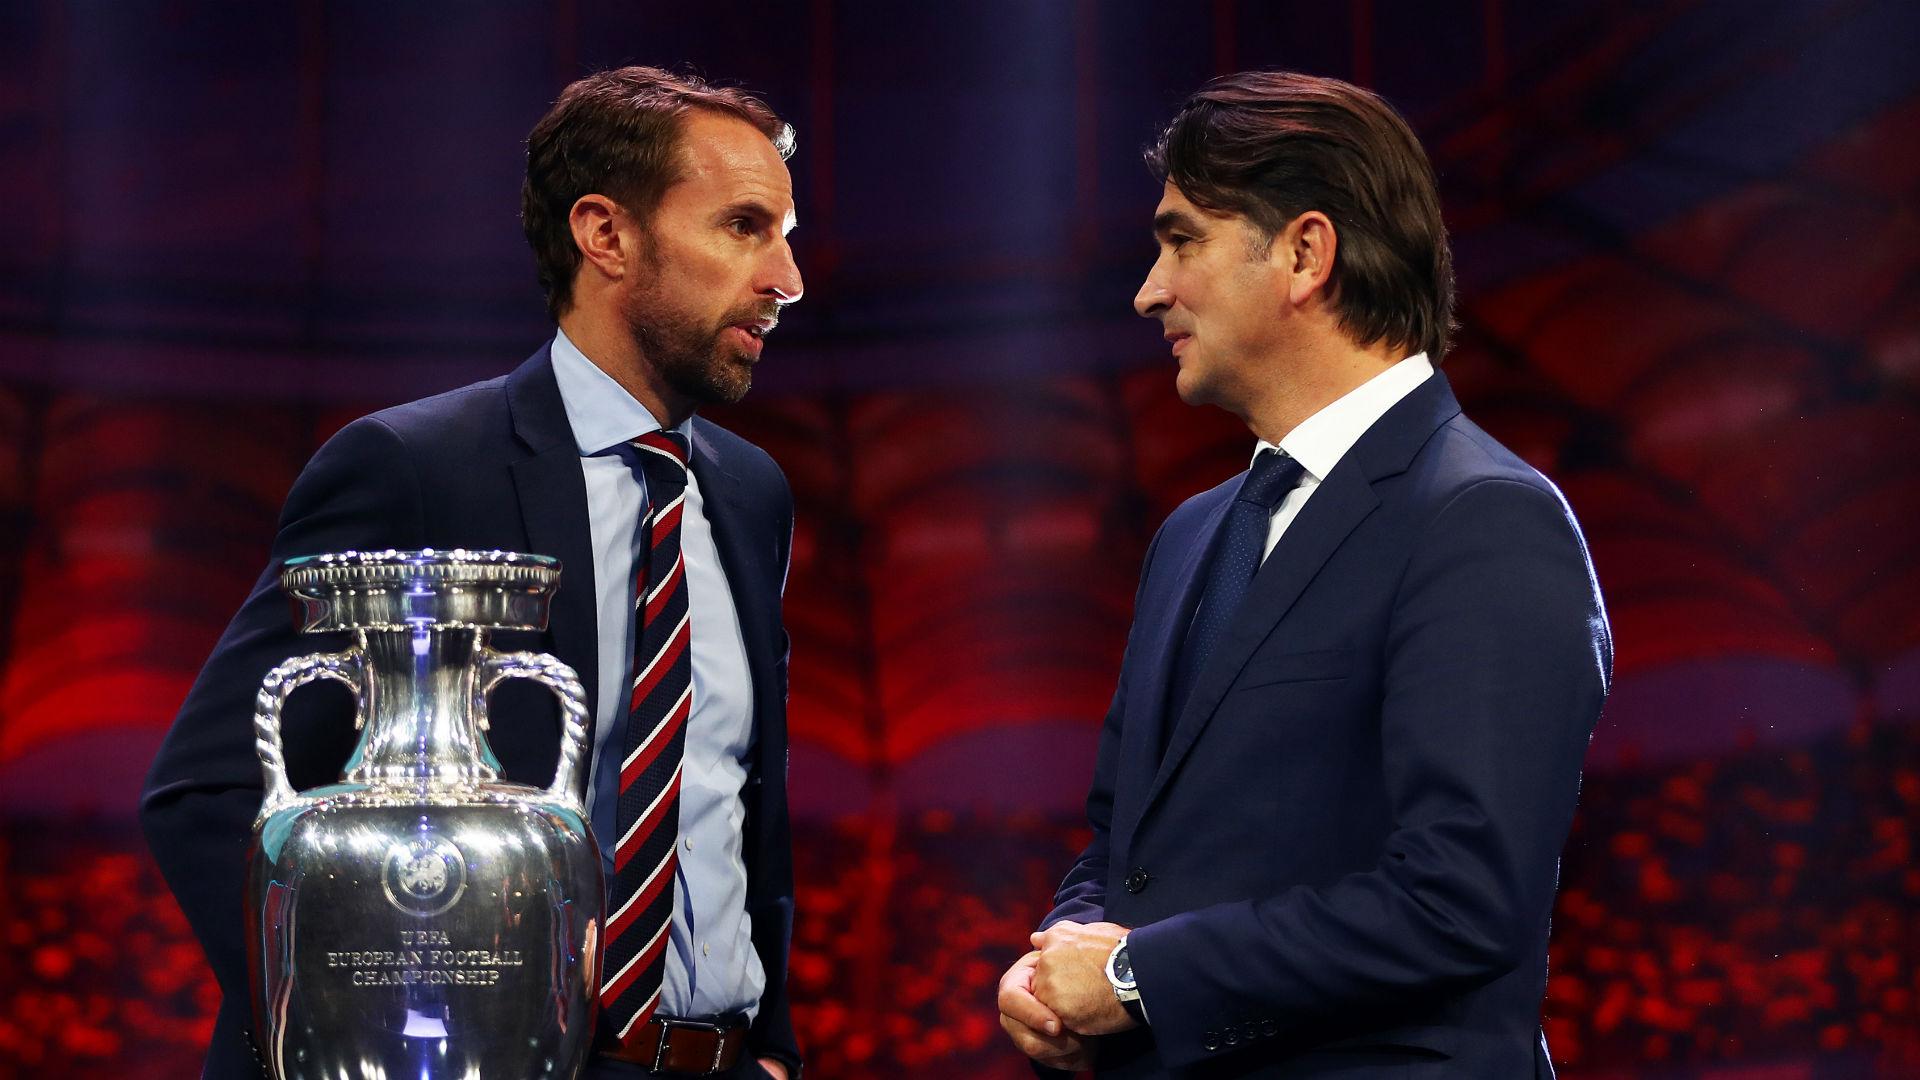 Euro 2020 draw: Southgate relishing 'top-level' England v Croatia showdown